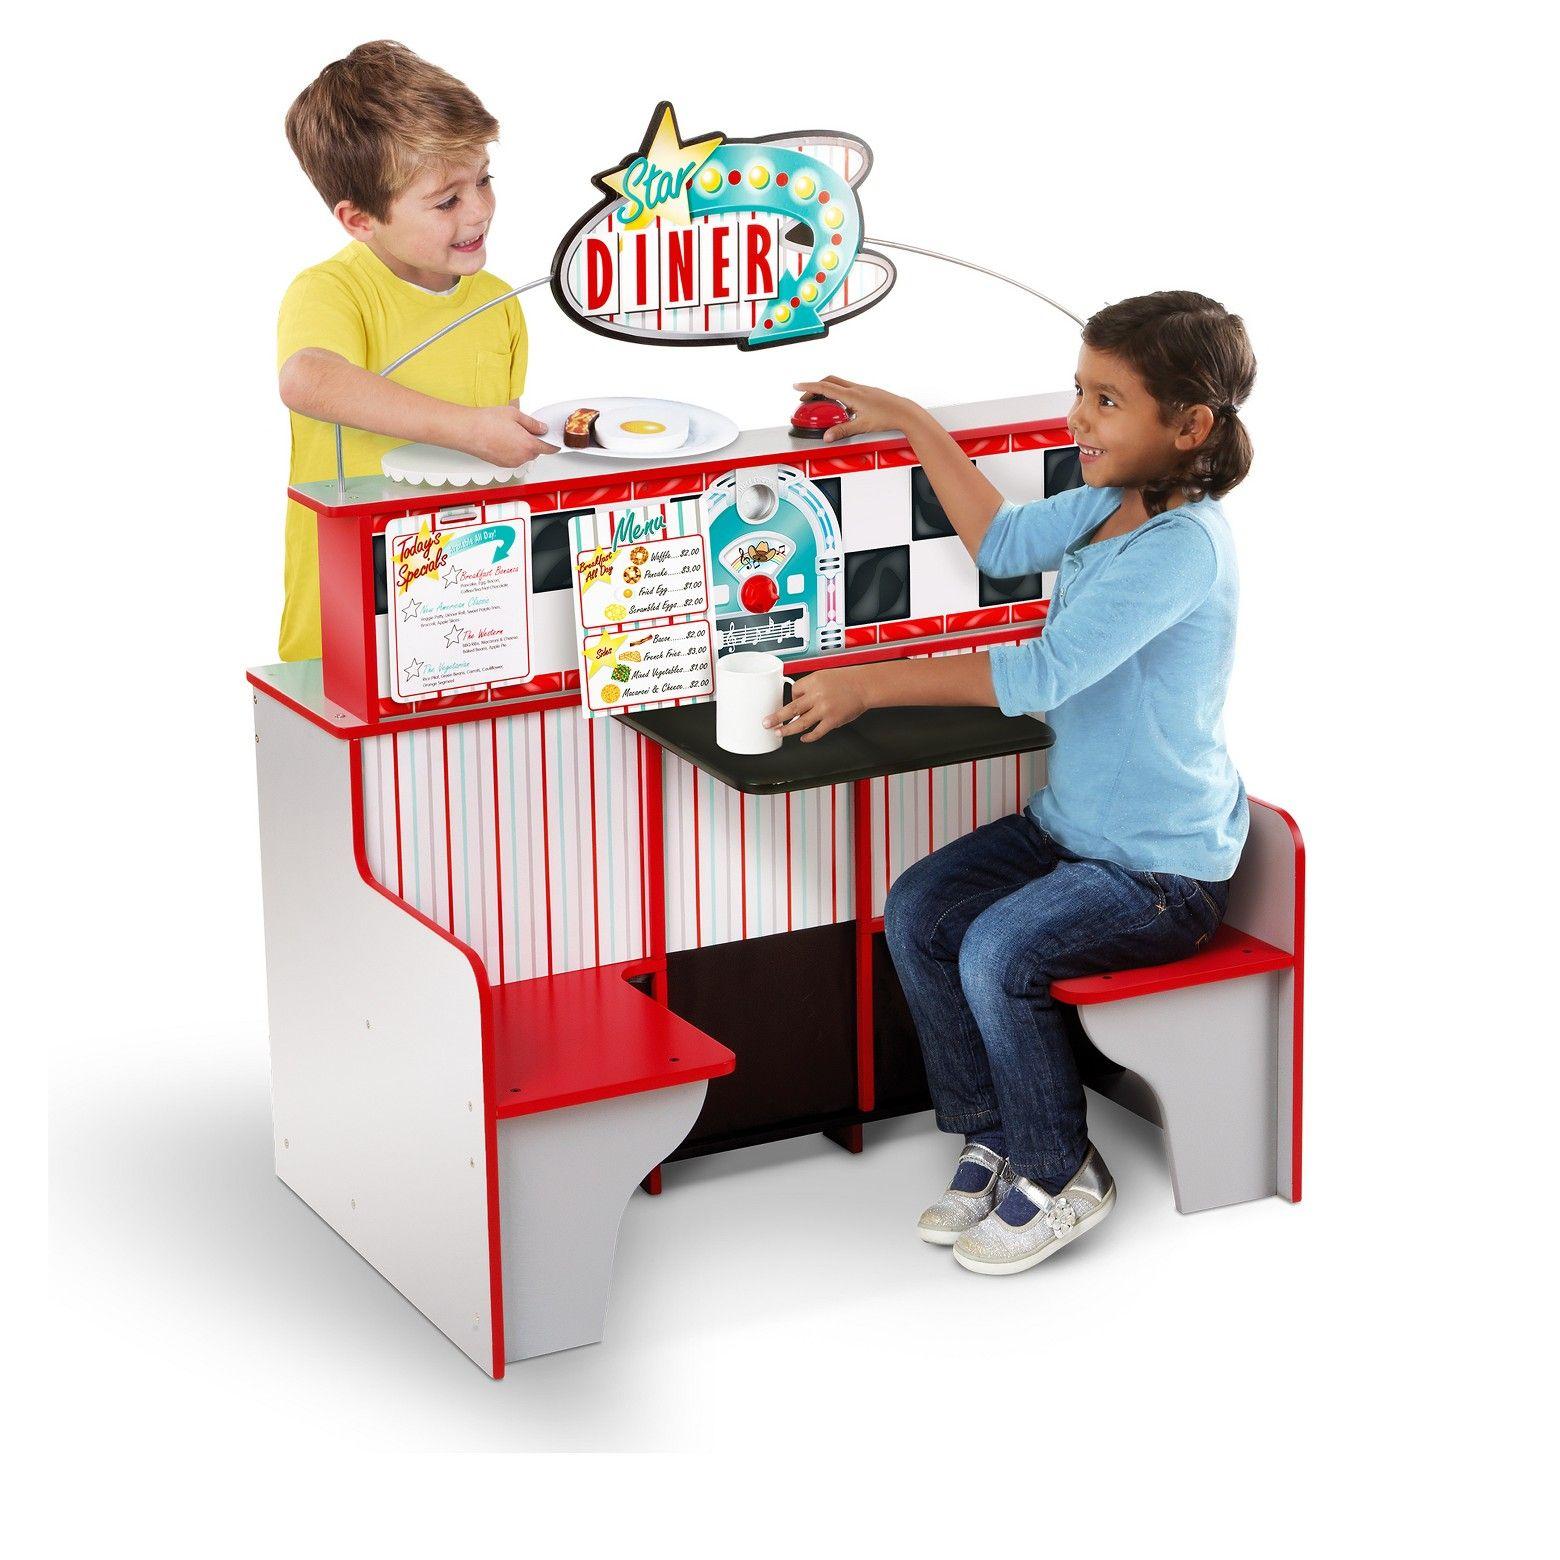 Barbie deluxe furniture stovetop to tabletop kitchen doll target - Melissa Doug Deluxe Star Diner Restaurant